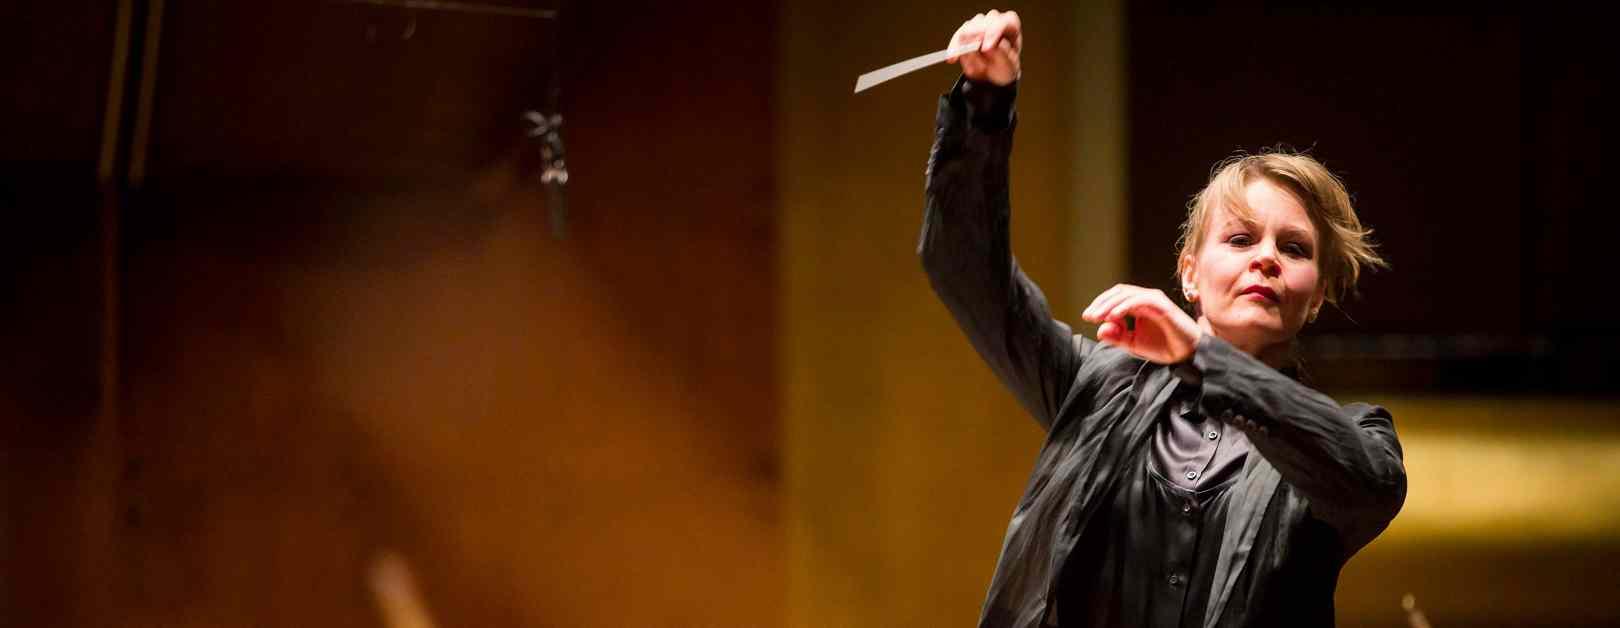 Susanna Mälkki Conducts Haydn, Strauss, and Unsuk Chin